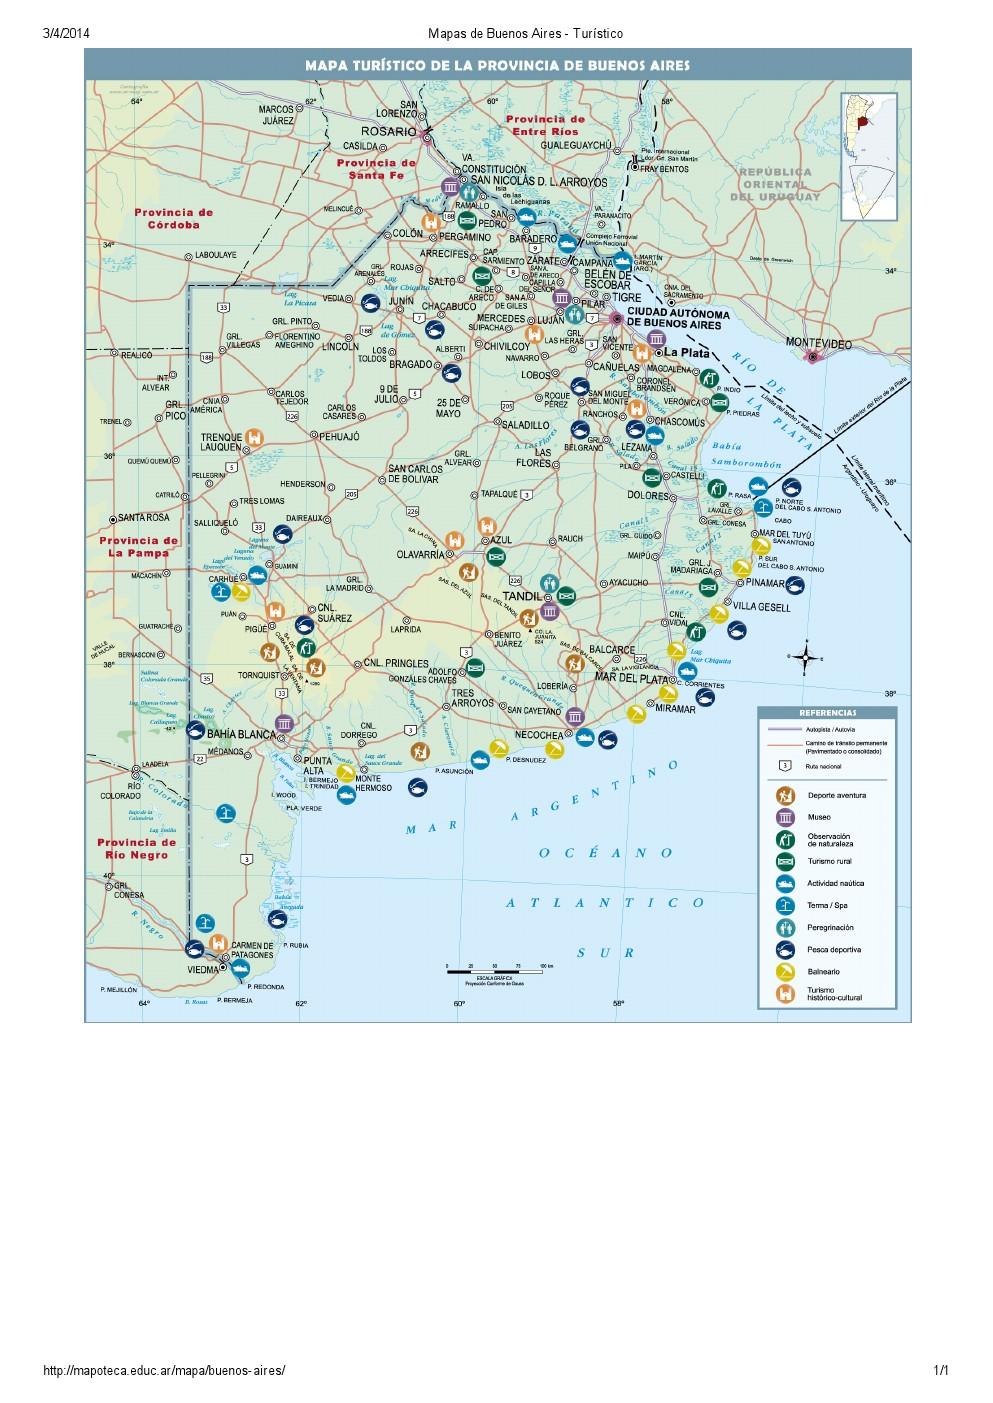 Mapa turístico de Buenos Aires. Mapoteca de Educ.ar